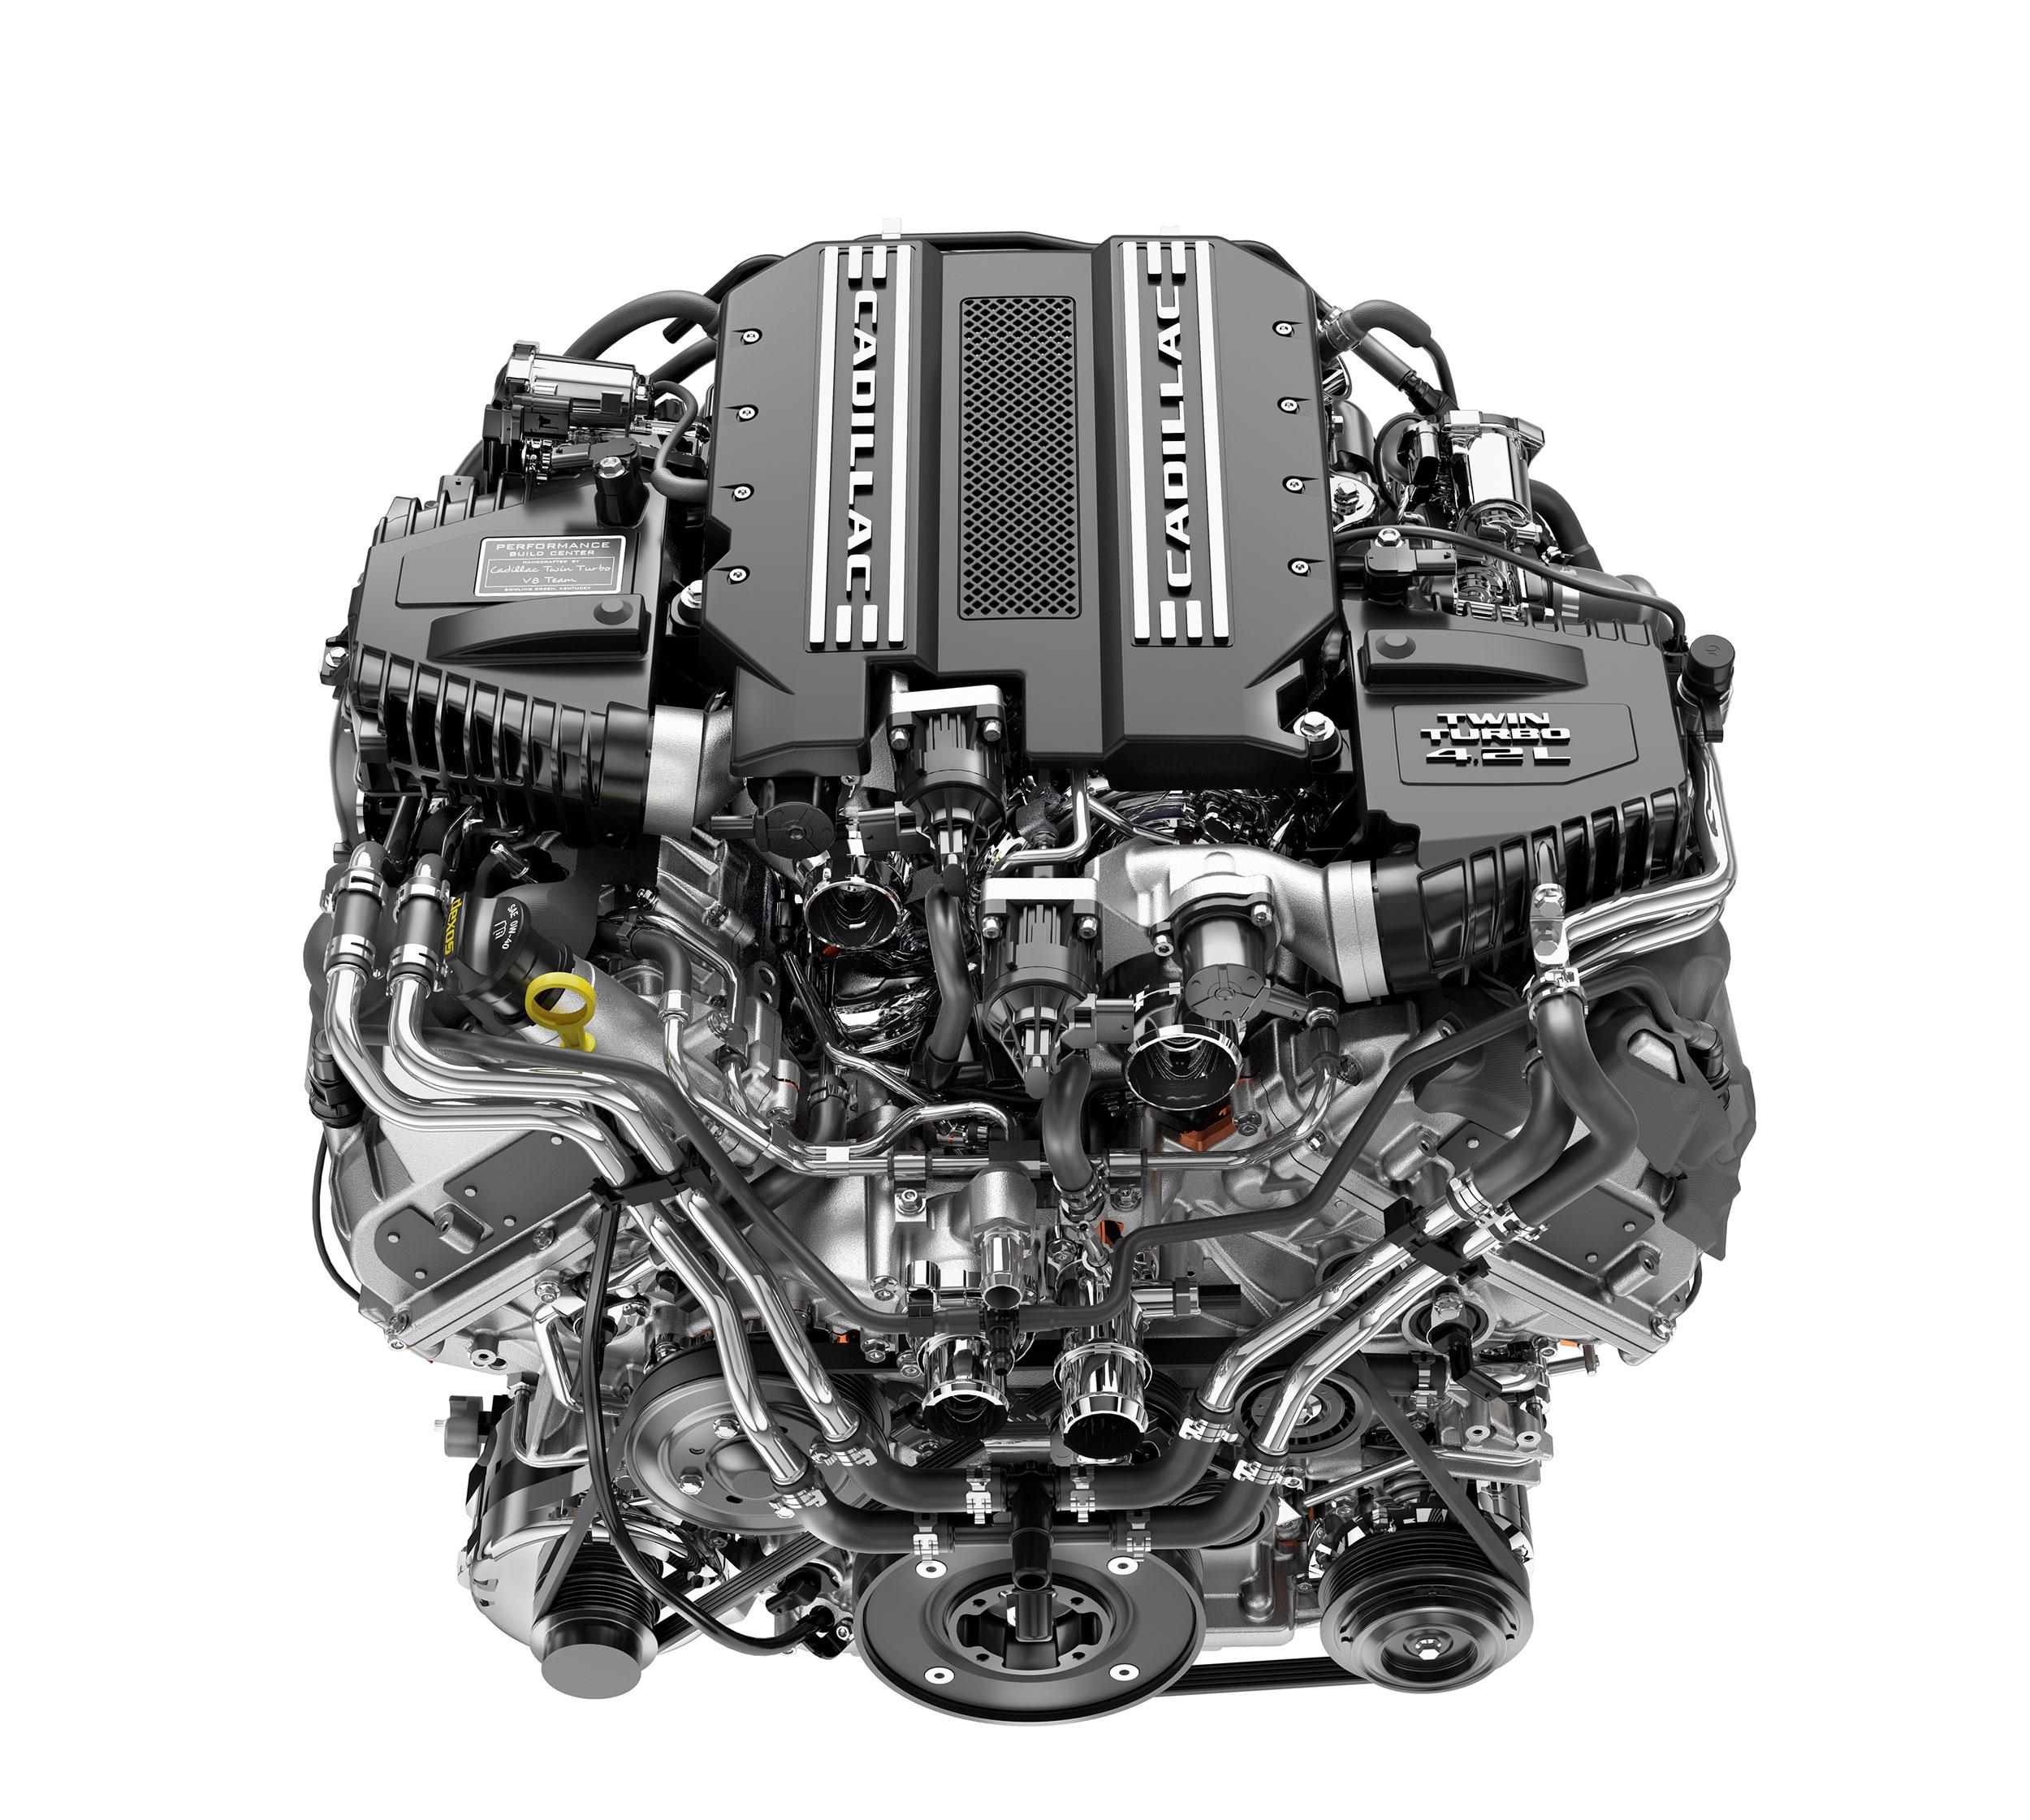 Cadillac CT6 V-Sport 4.2L Twin Turbo V-8 front